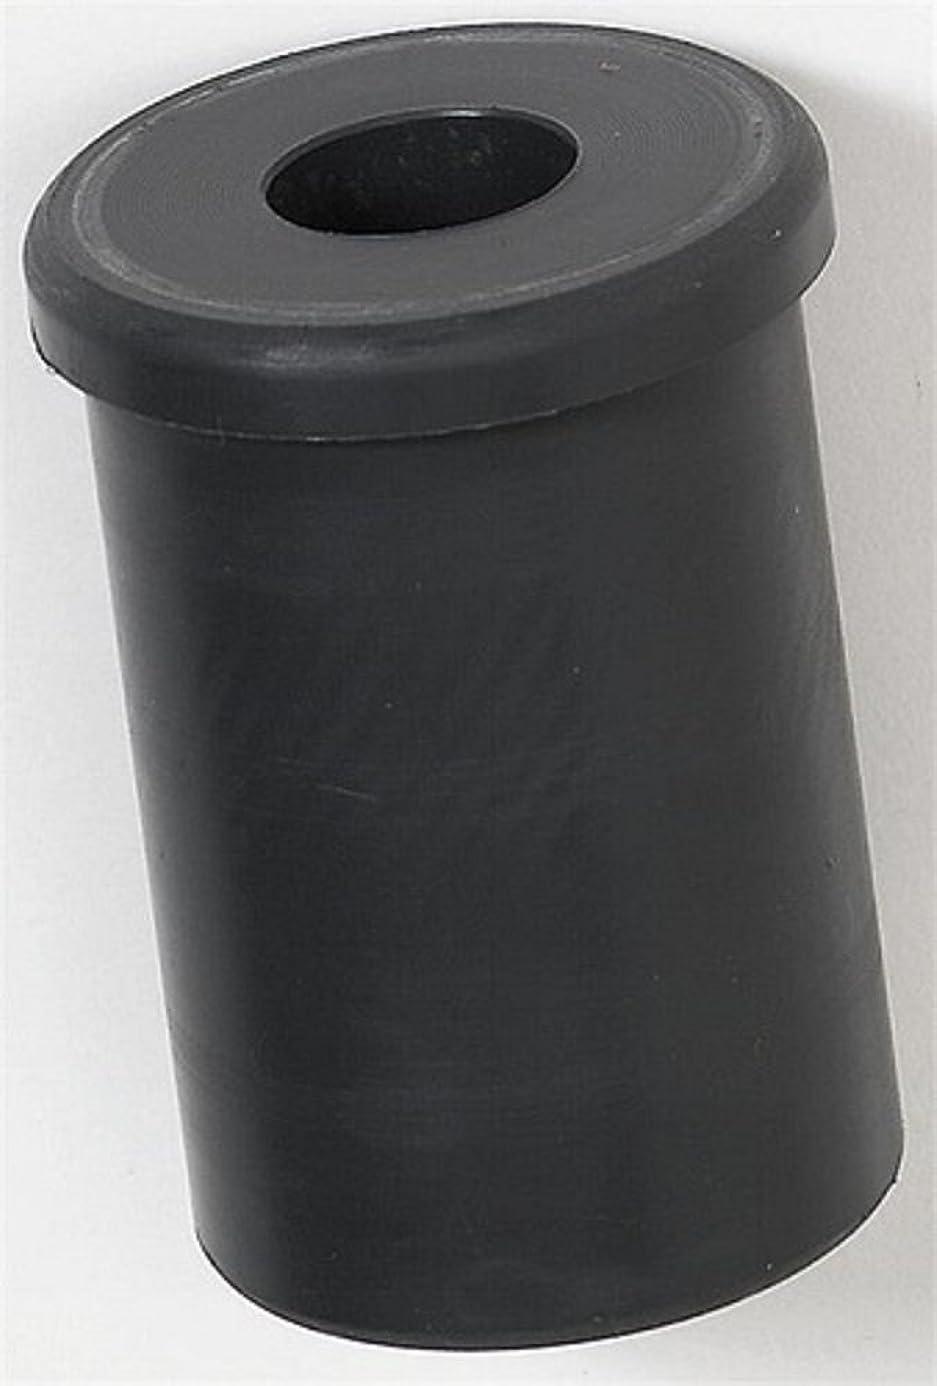 Swivl-Eze Adapter Bushing 1.77X3/4 SP-14000